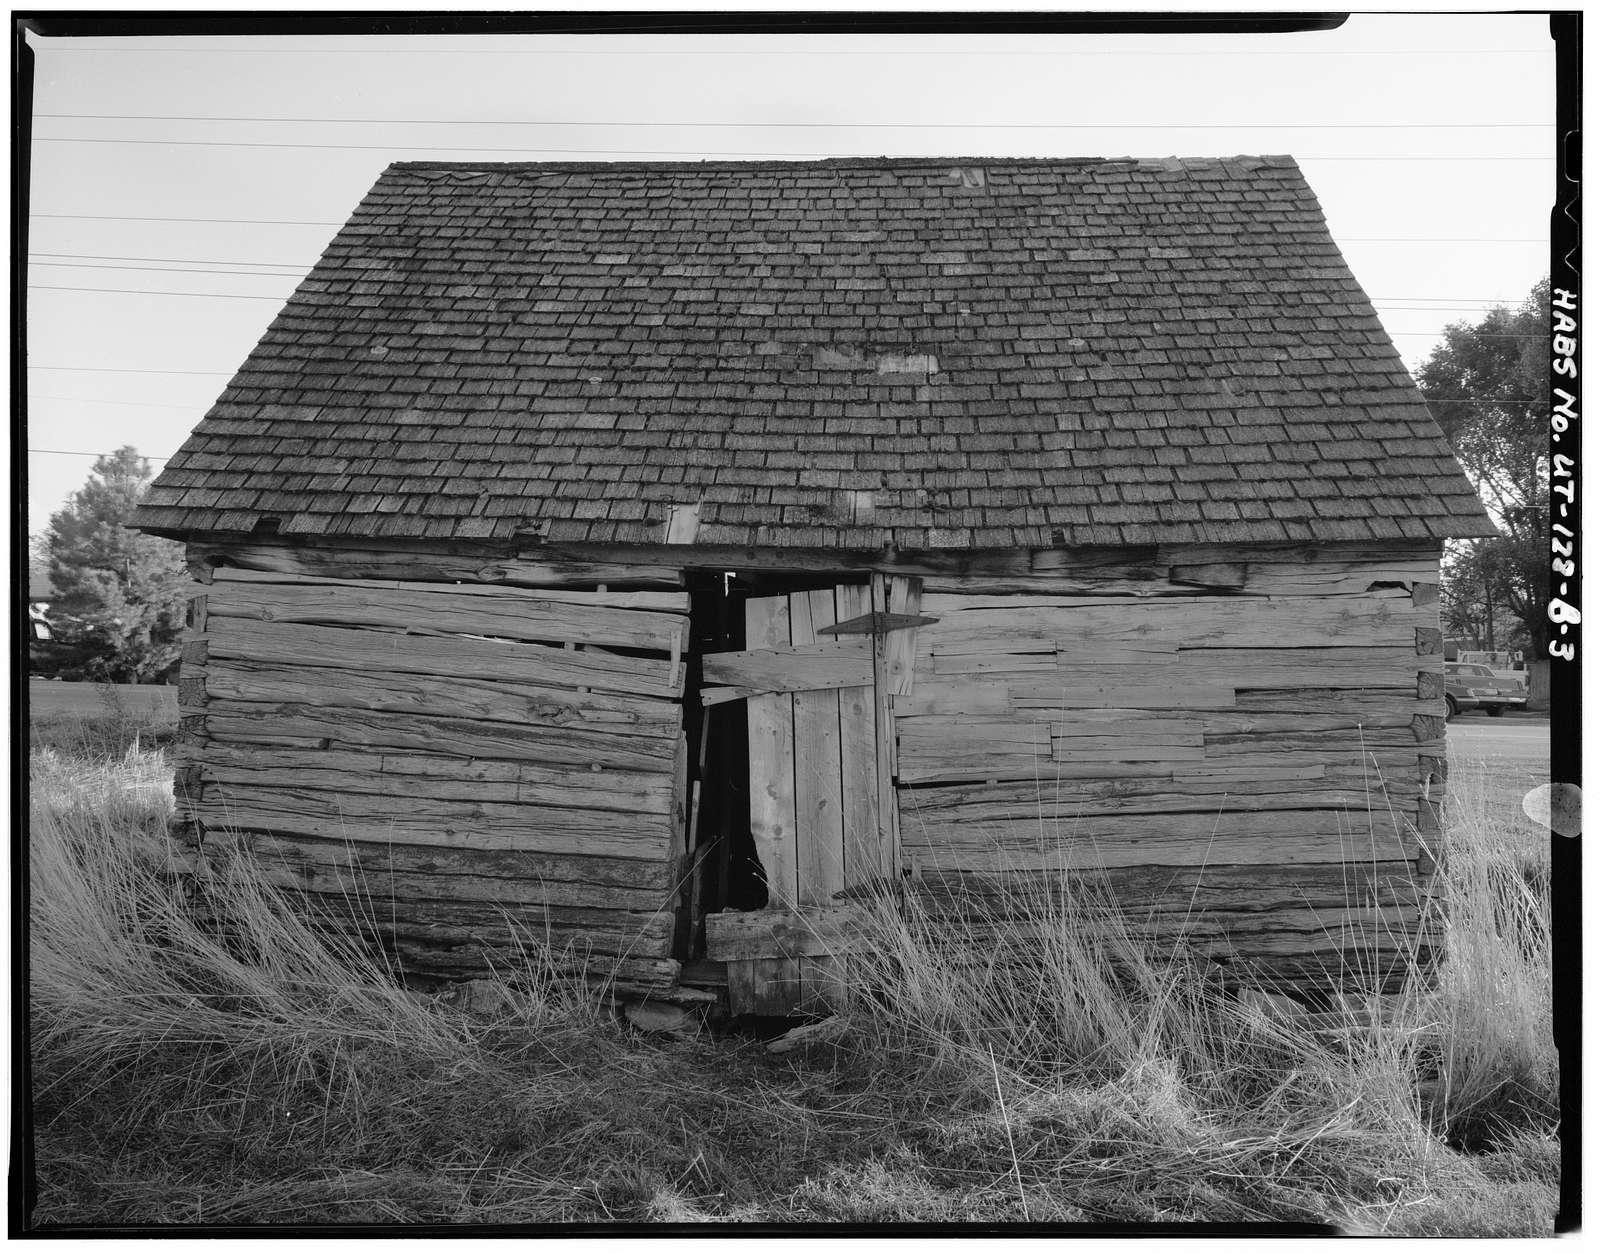 Jeppa Nelson, Log Granary, 150 West 1100 North Street, Pleasant Grove, Utah County, UT